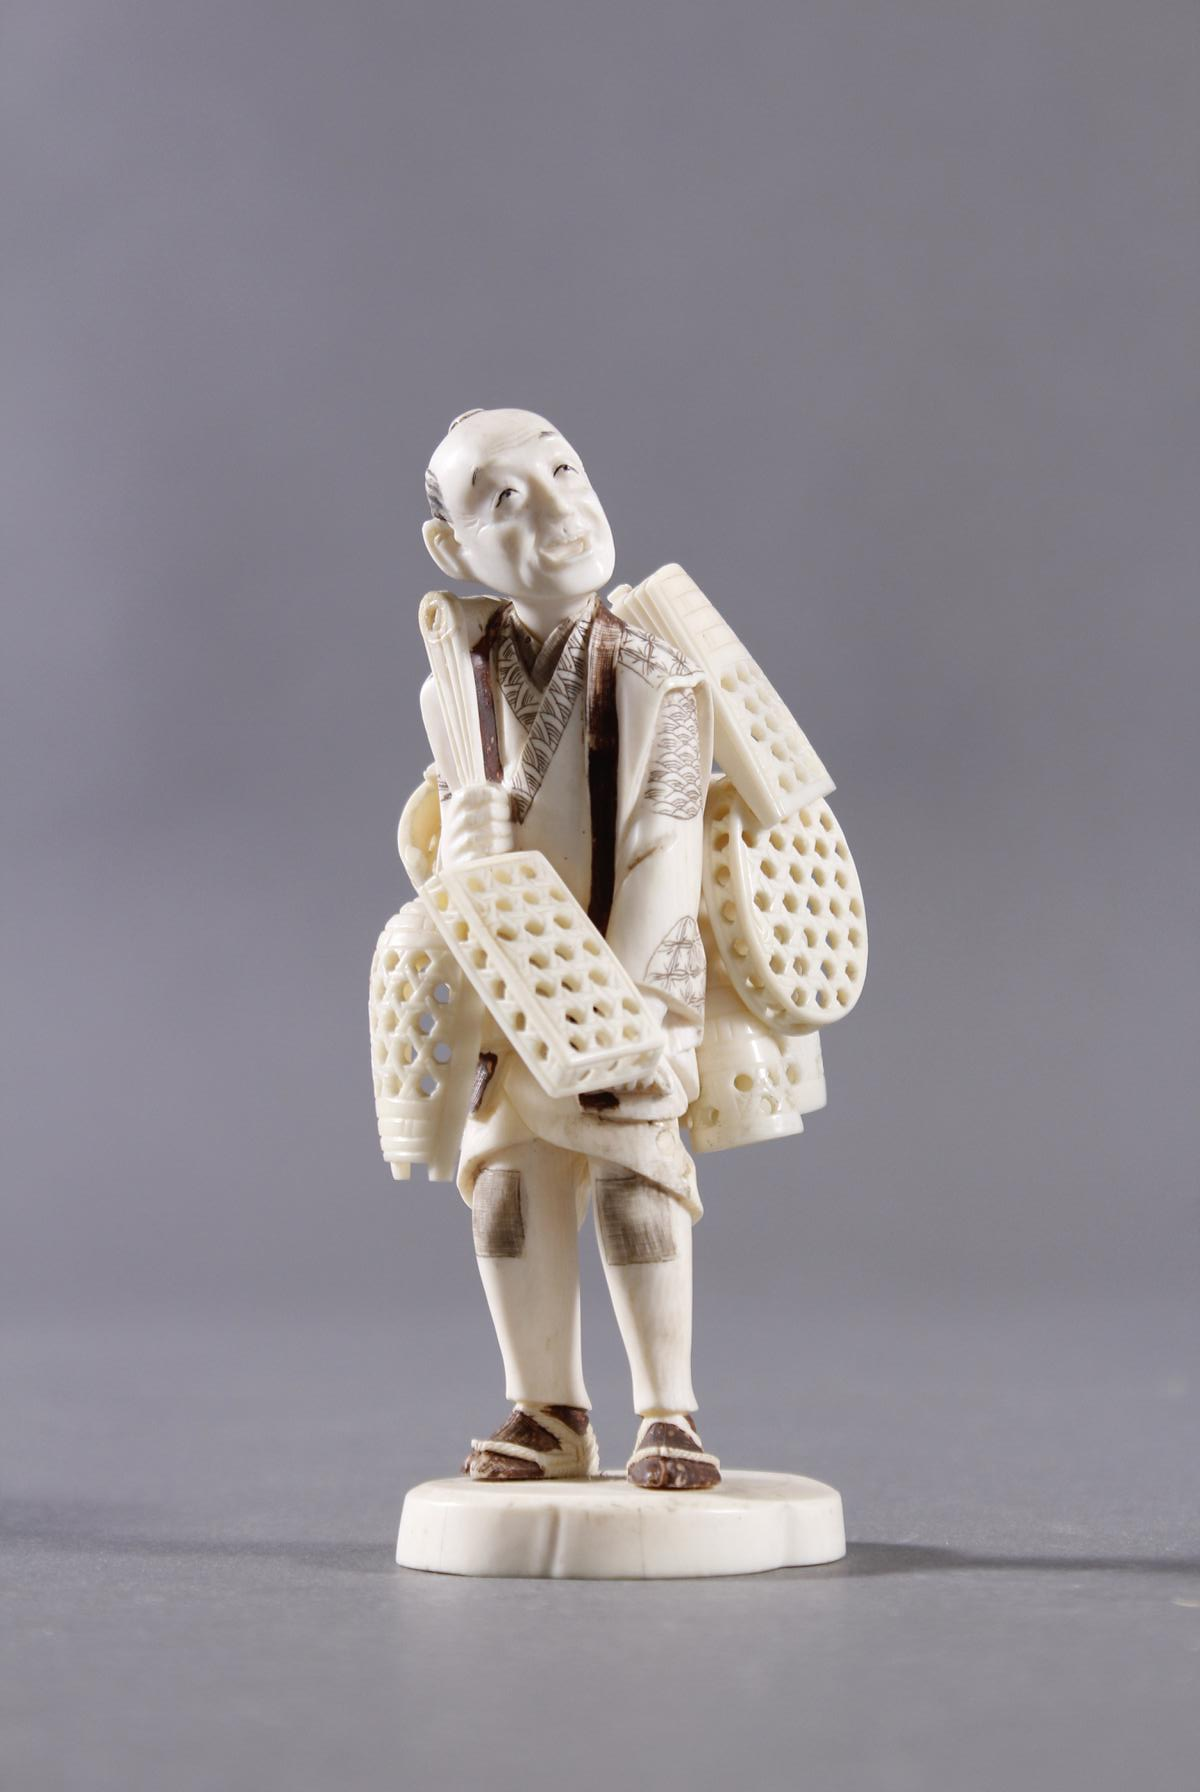 Elfenbeinfigur, Korbverkäufer, Japan, Meiji-Periode